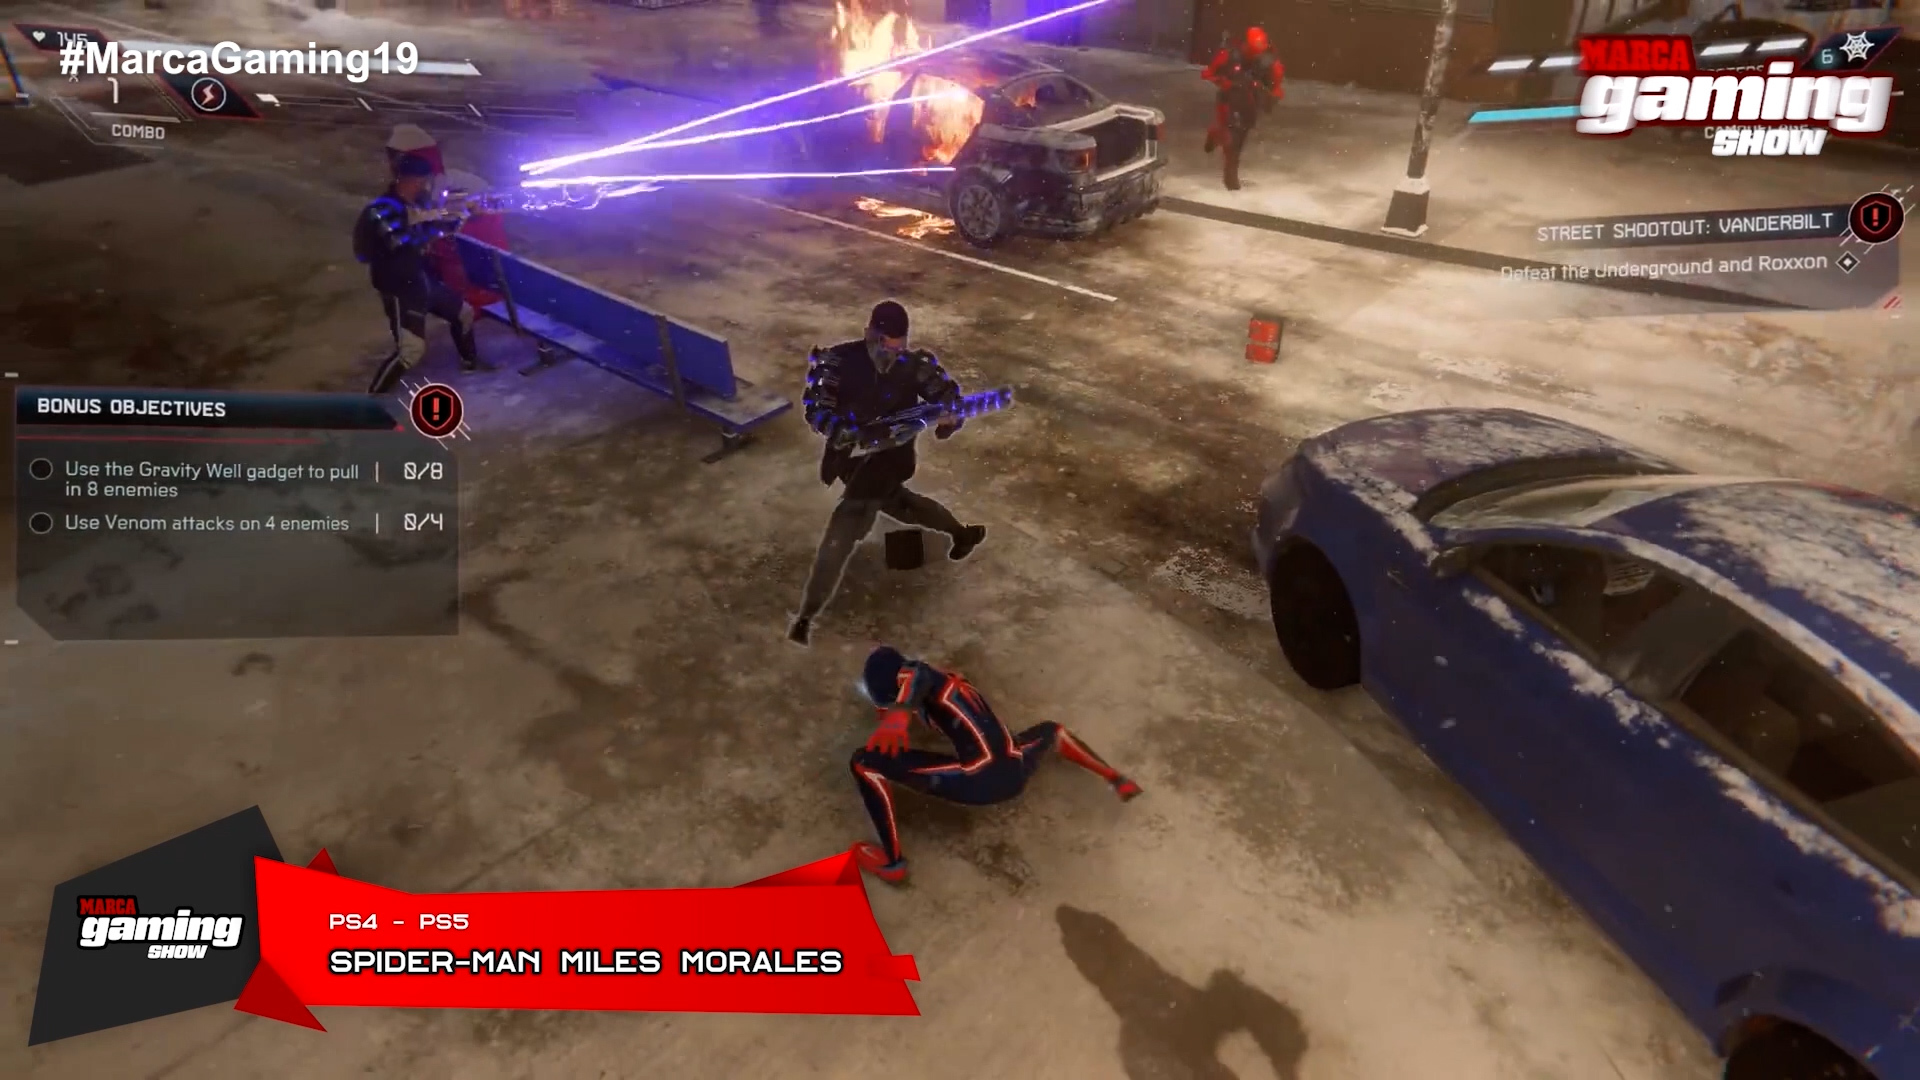 Spider-Man Miles Morales (PS4 - PS5)